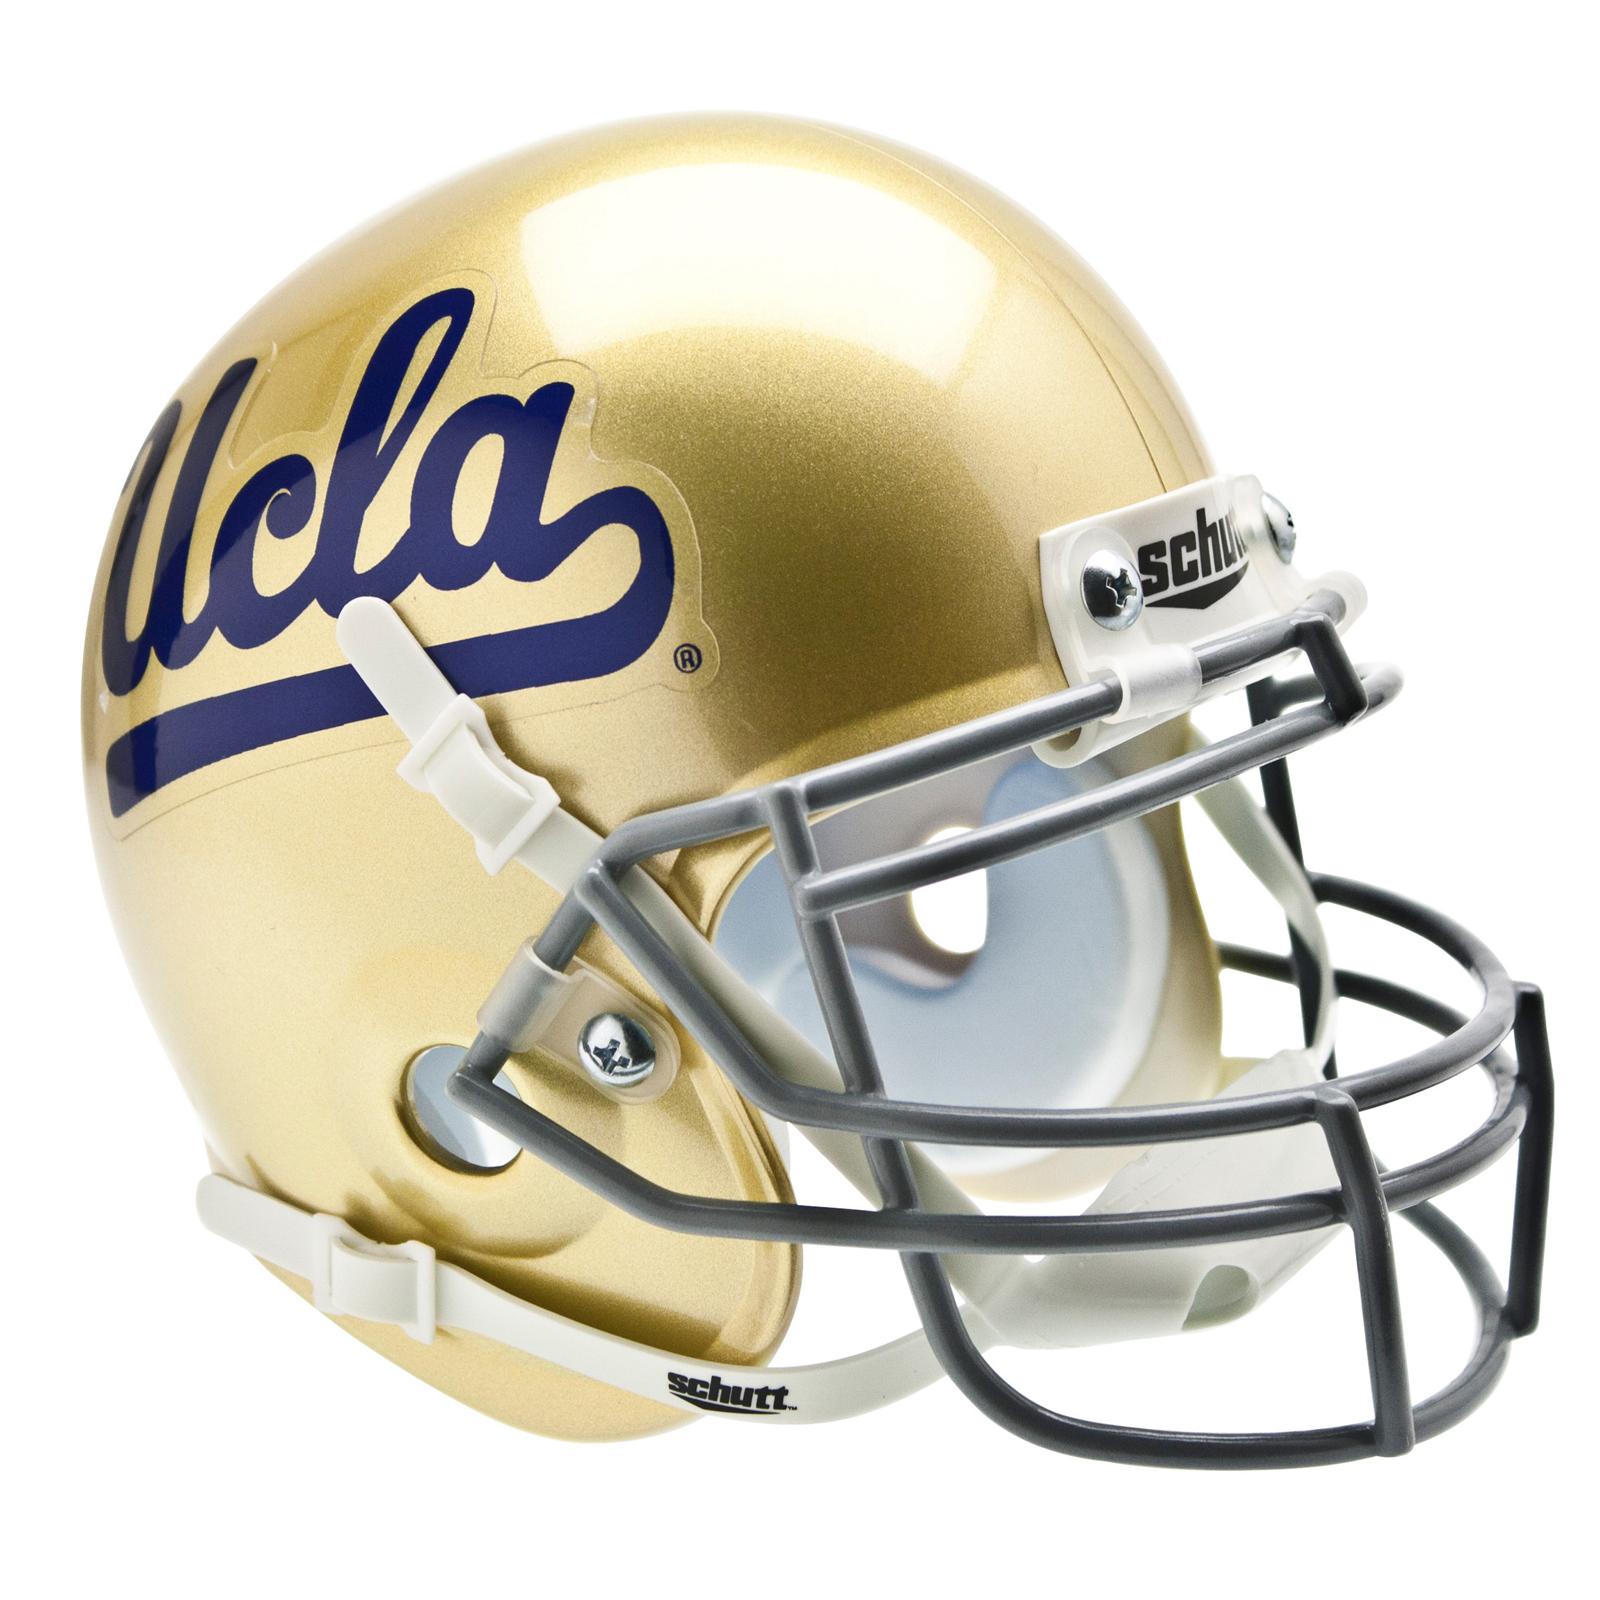 Image of Schutts Sports University of California Bruins NCAA Mini Helmet, metal